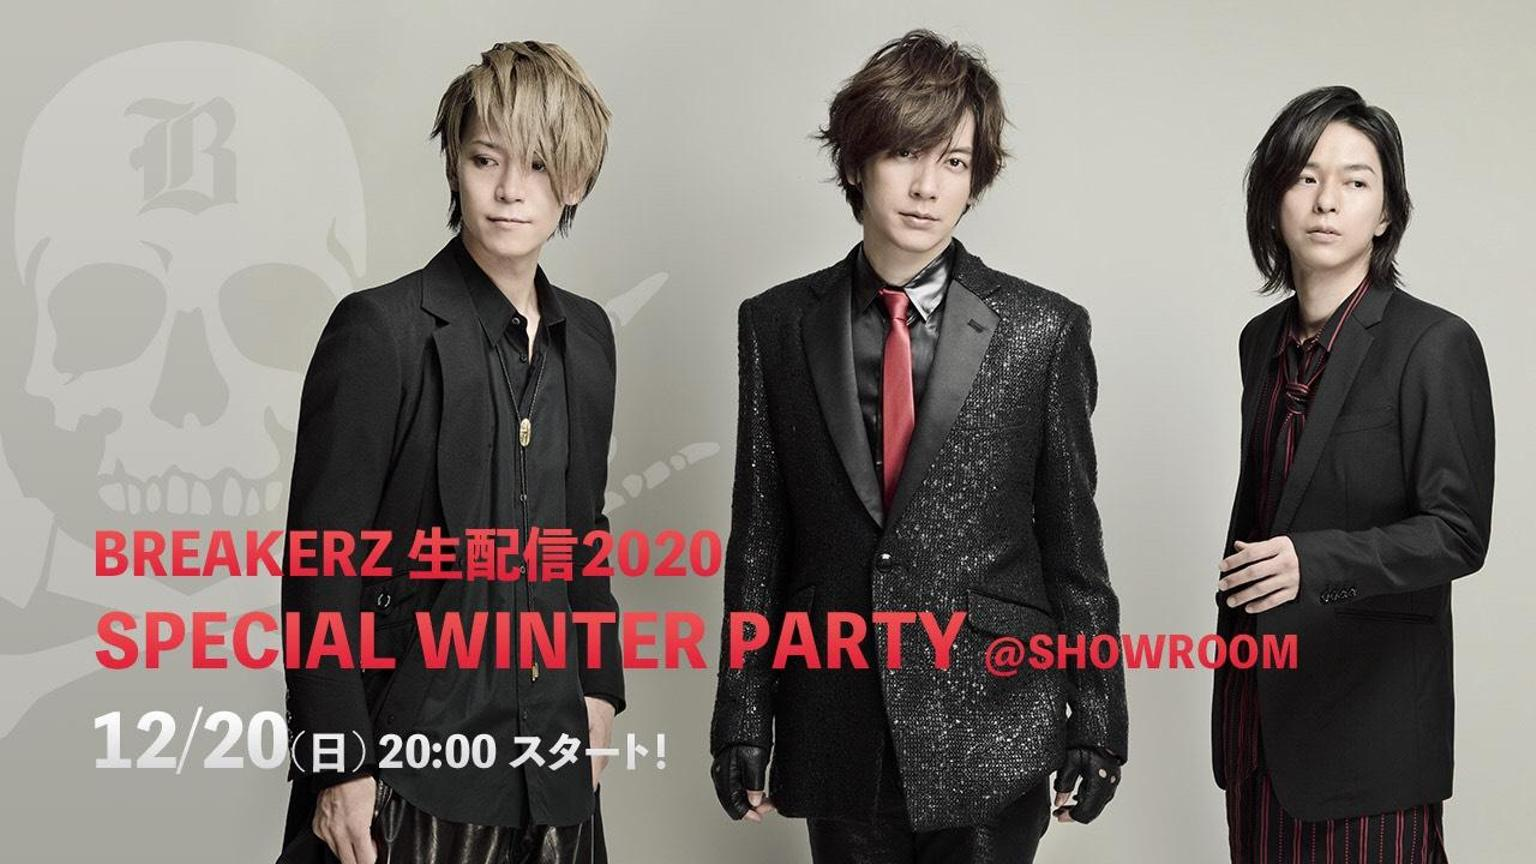 BREAKERZ SPECIAL WINTER PARTY